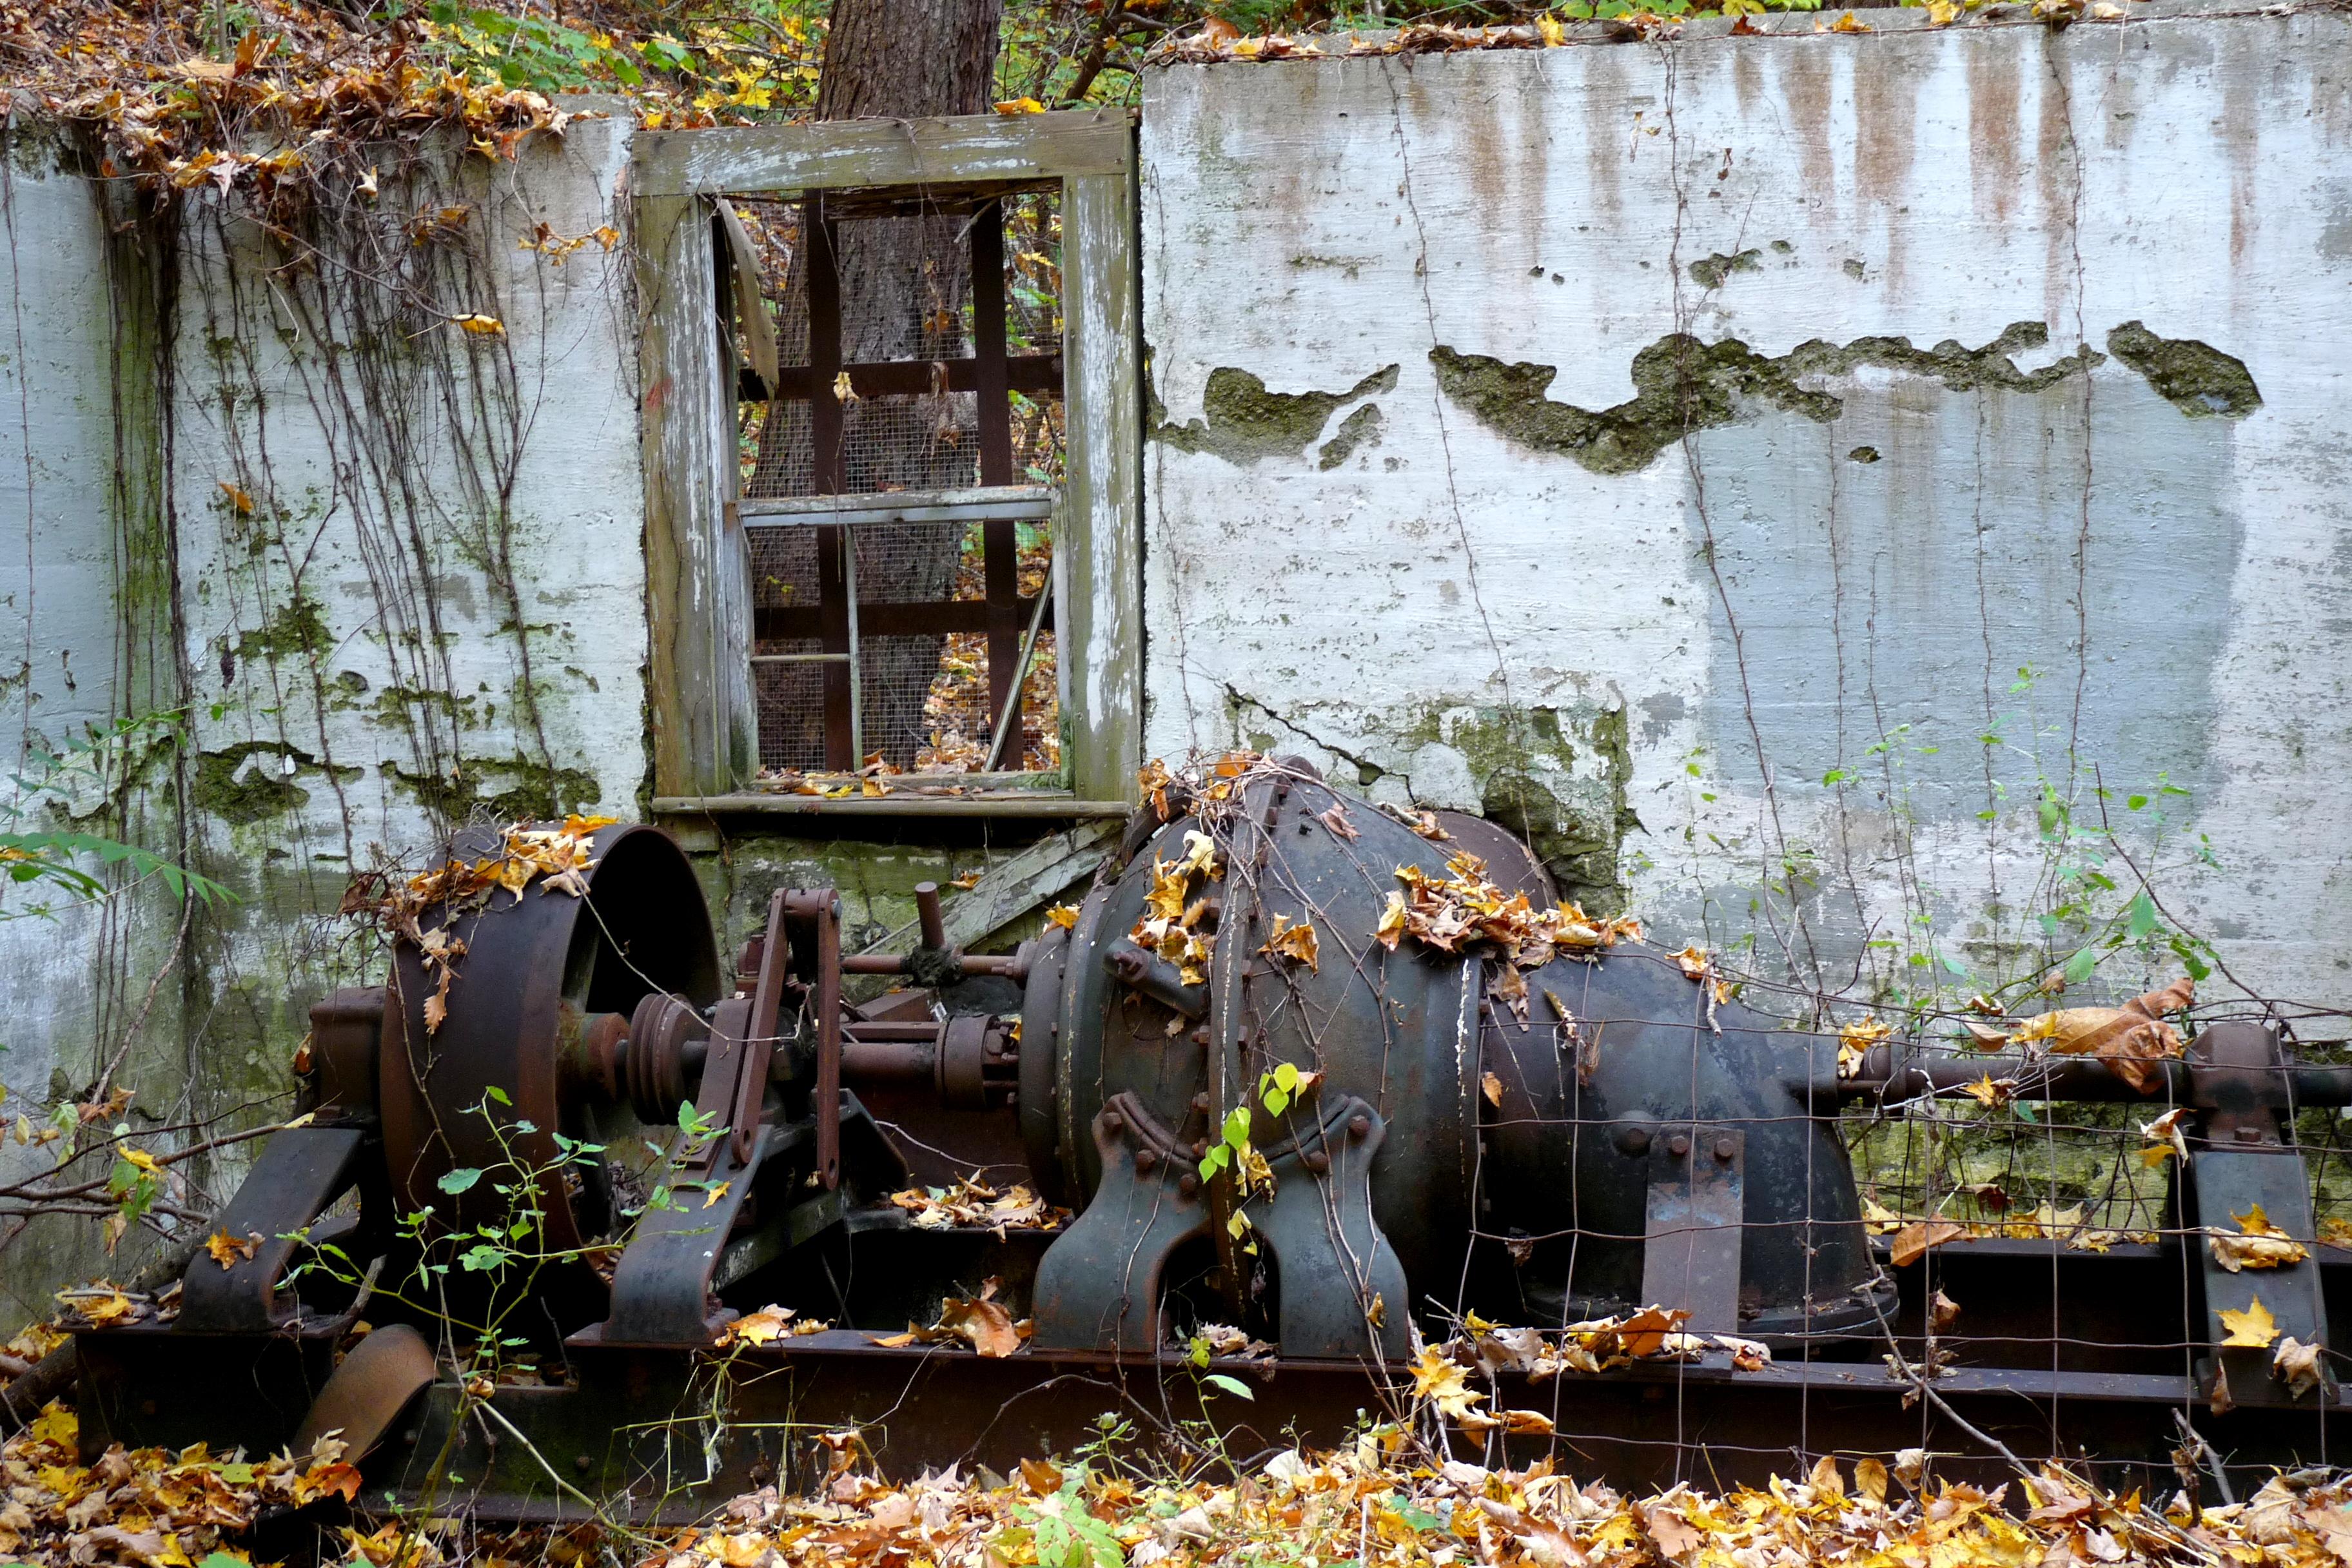 Abandoned power station, Montgomery Place estate NY - photo by E. Jurus